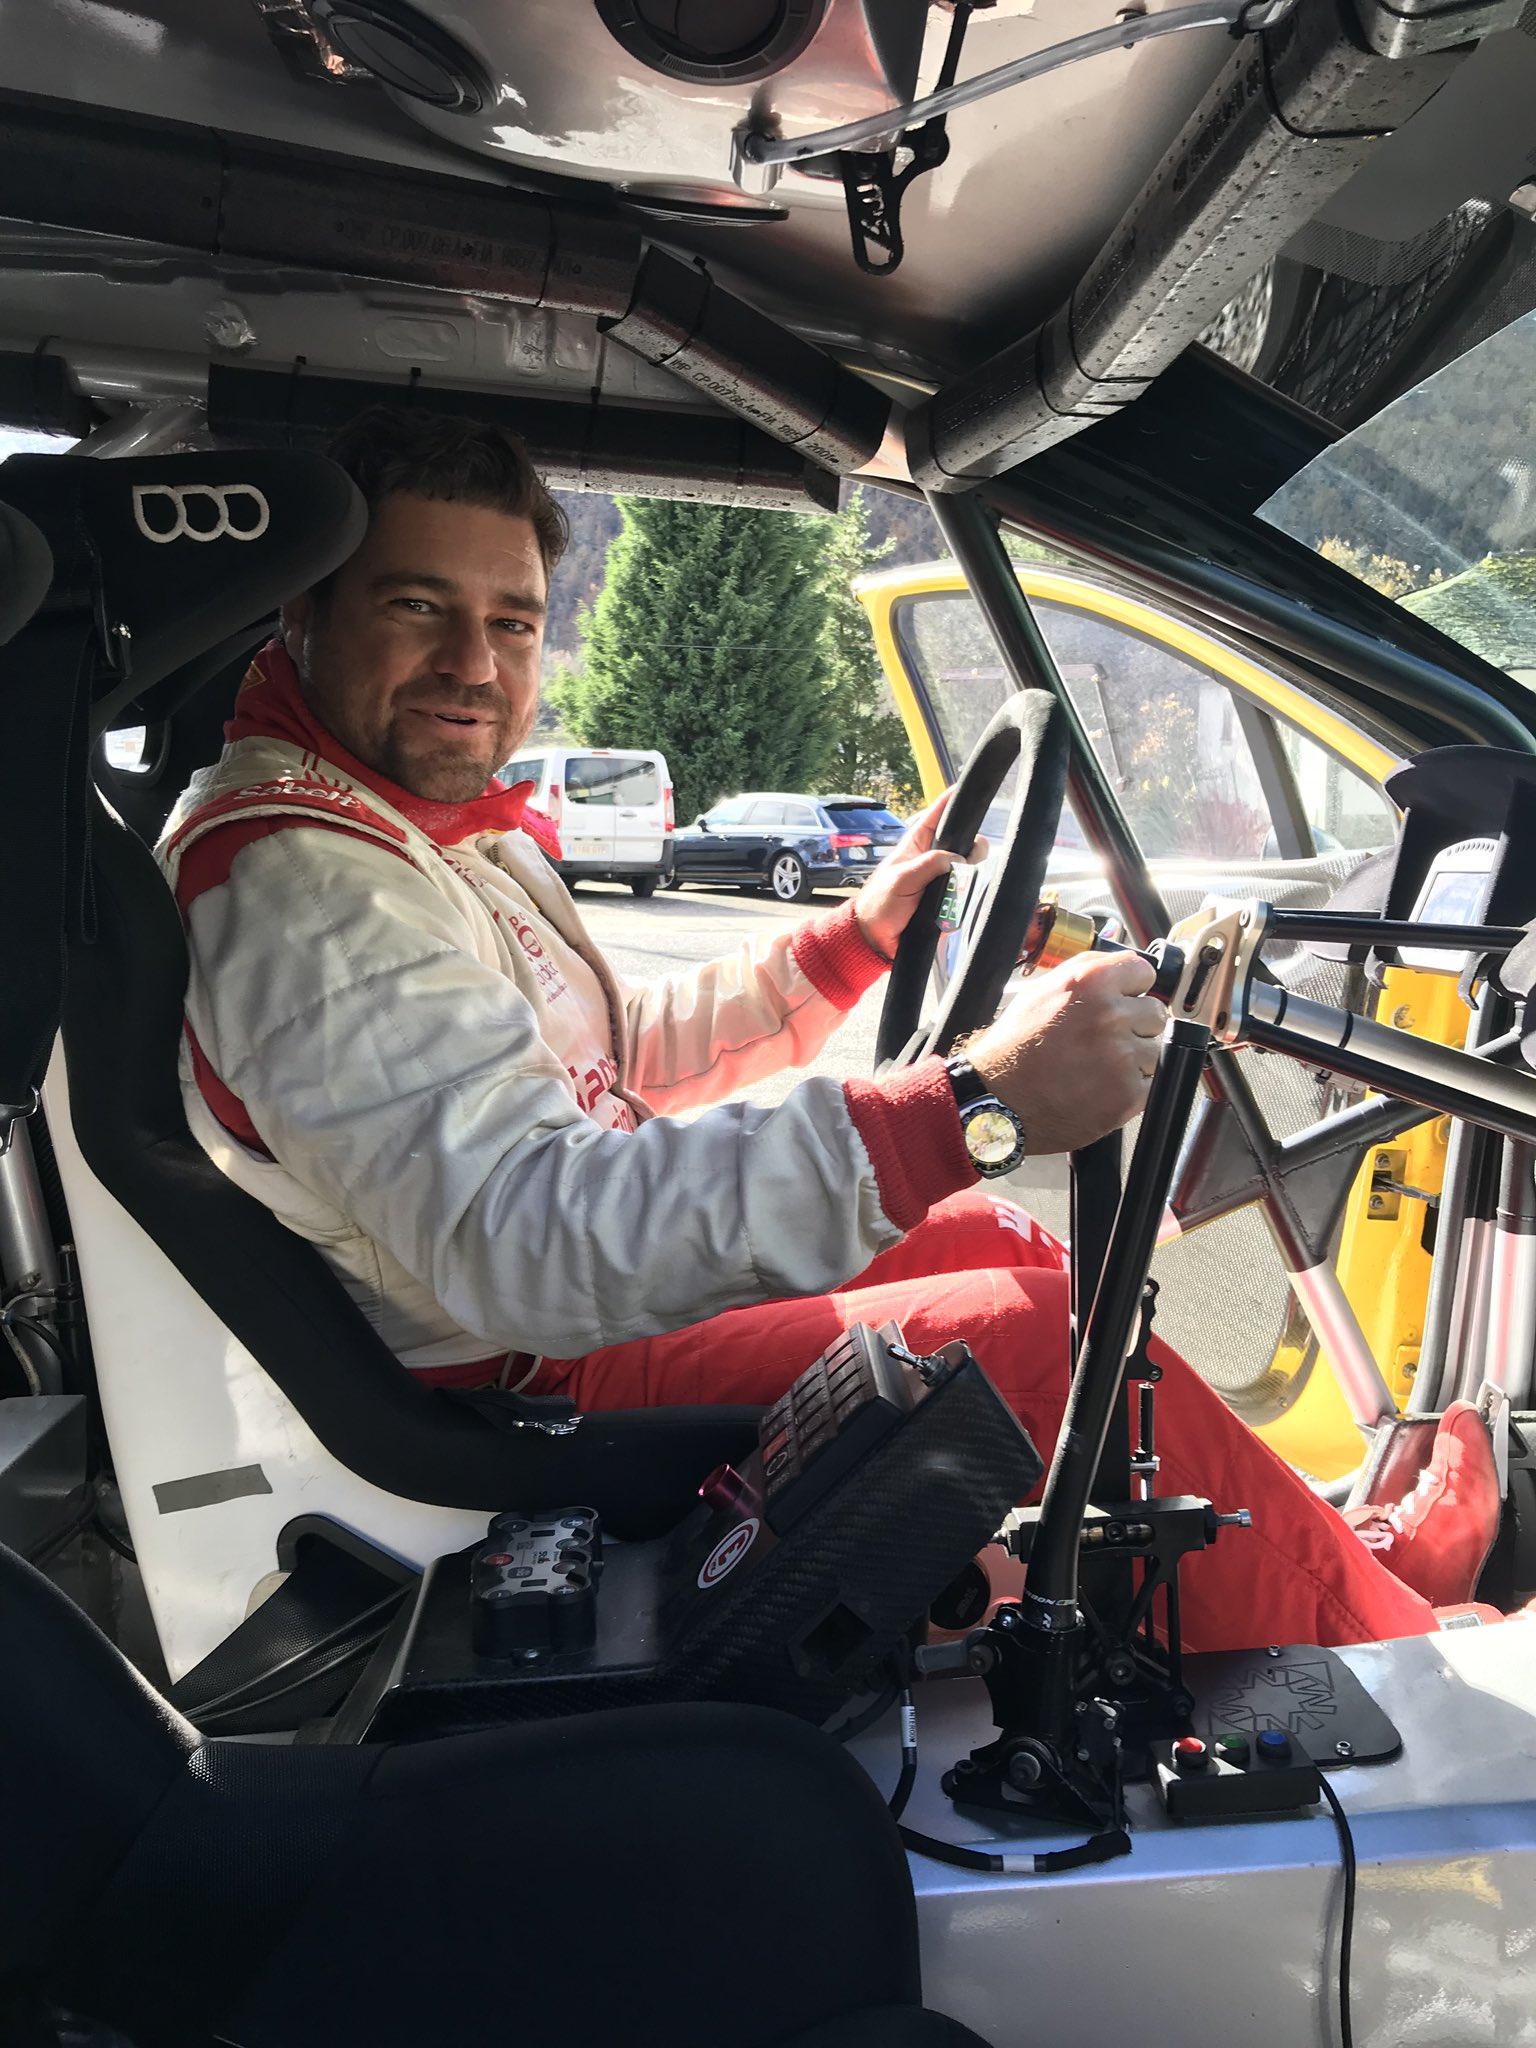 CERA: 9º Rallye Comunidad de Madrid - RACE [23-24 Noviembre] - Página 2 DscFVF7W0AAZmnb